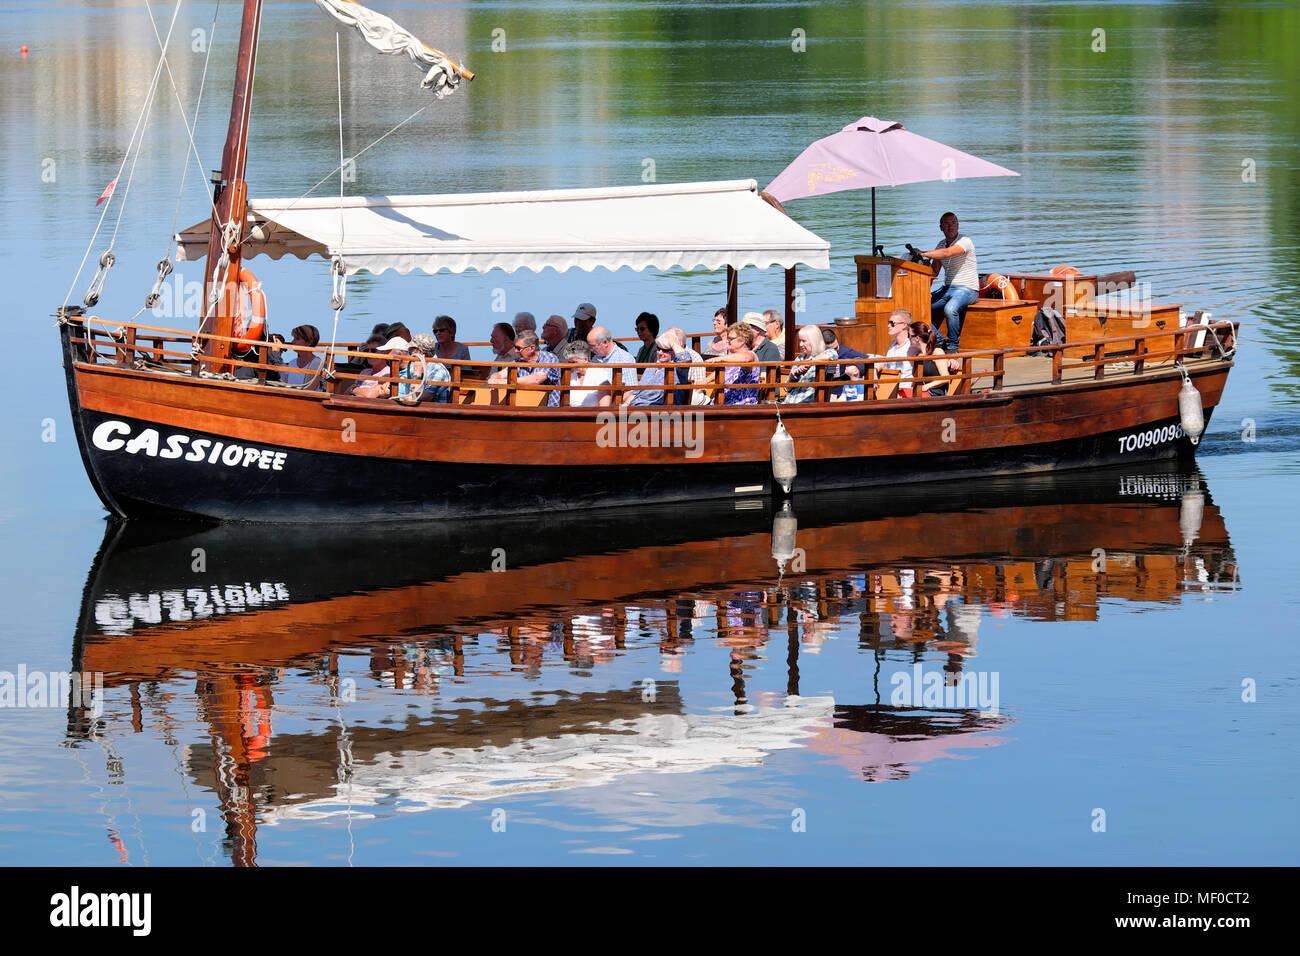 Barcaza tradicional viaje en barco en el río Dordoña, Bergerac, Nouvelle-Aquitaine, Francia Imagen De Stock